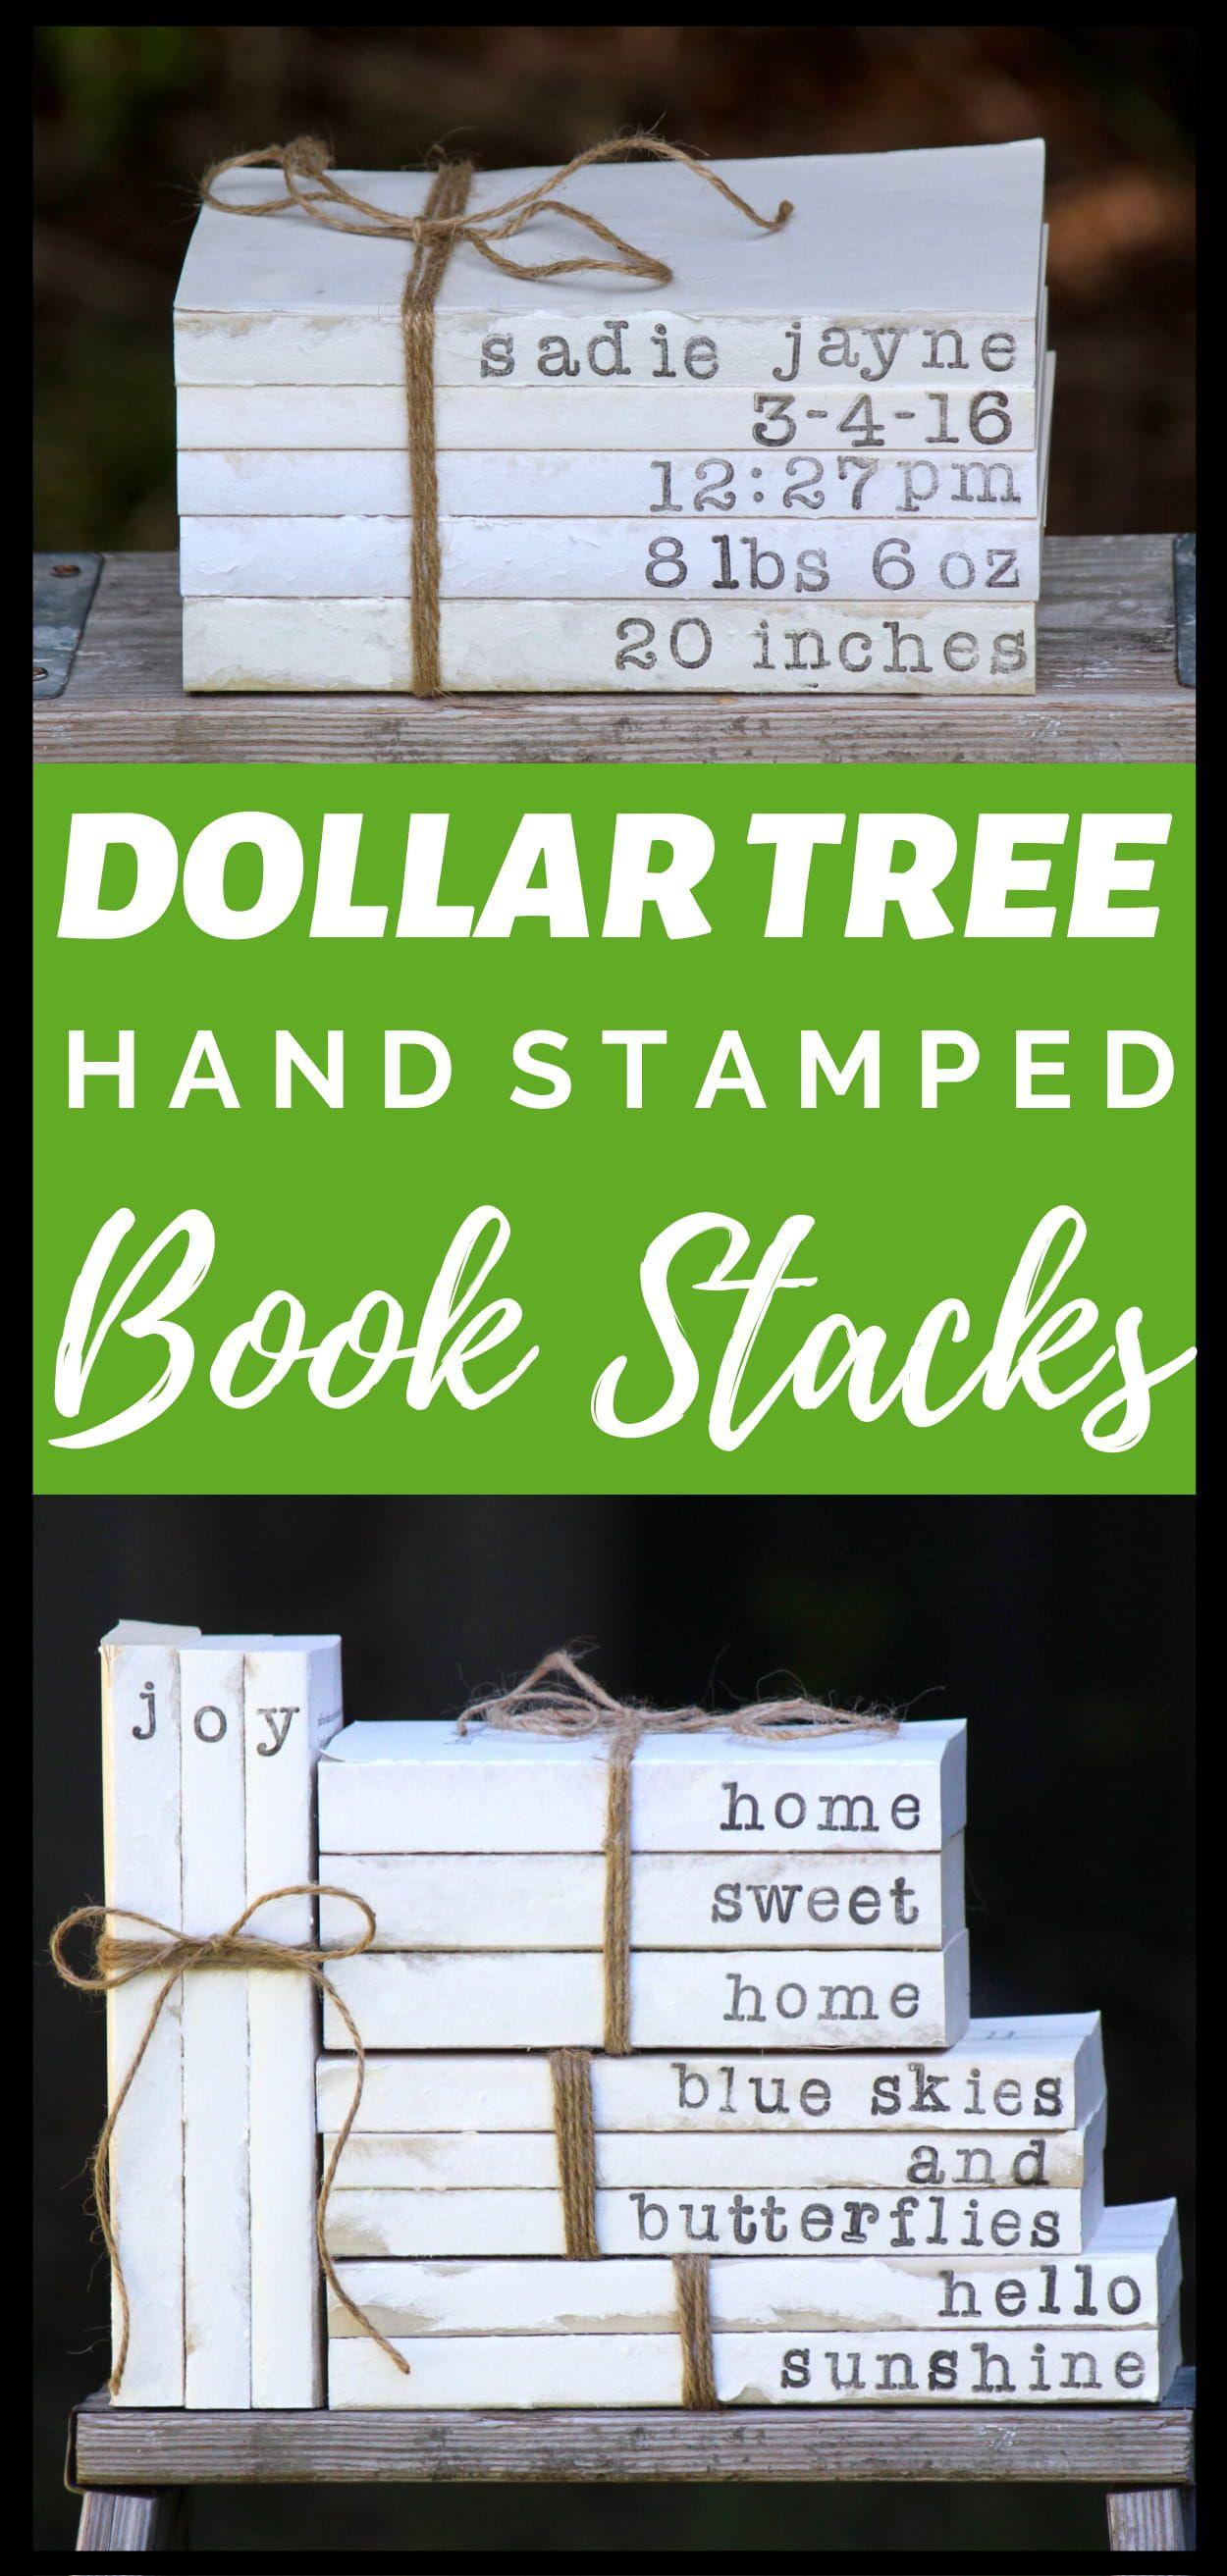 DIY Dollar Tree Hand Stamped Book Stacks